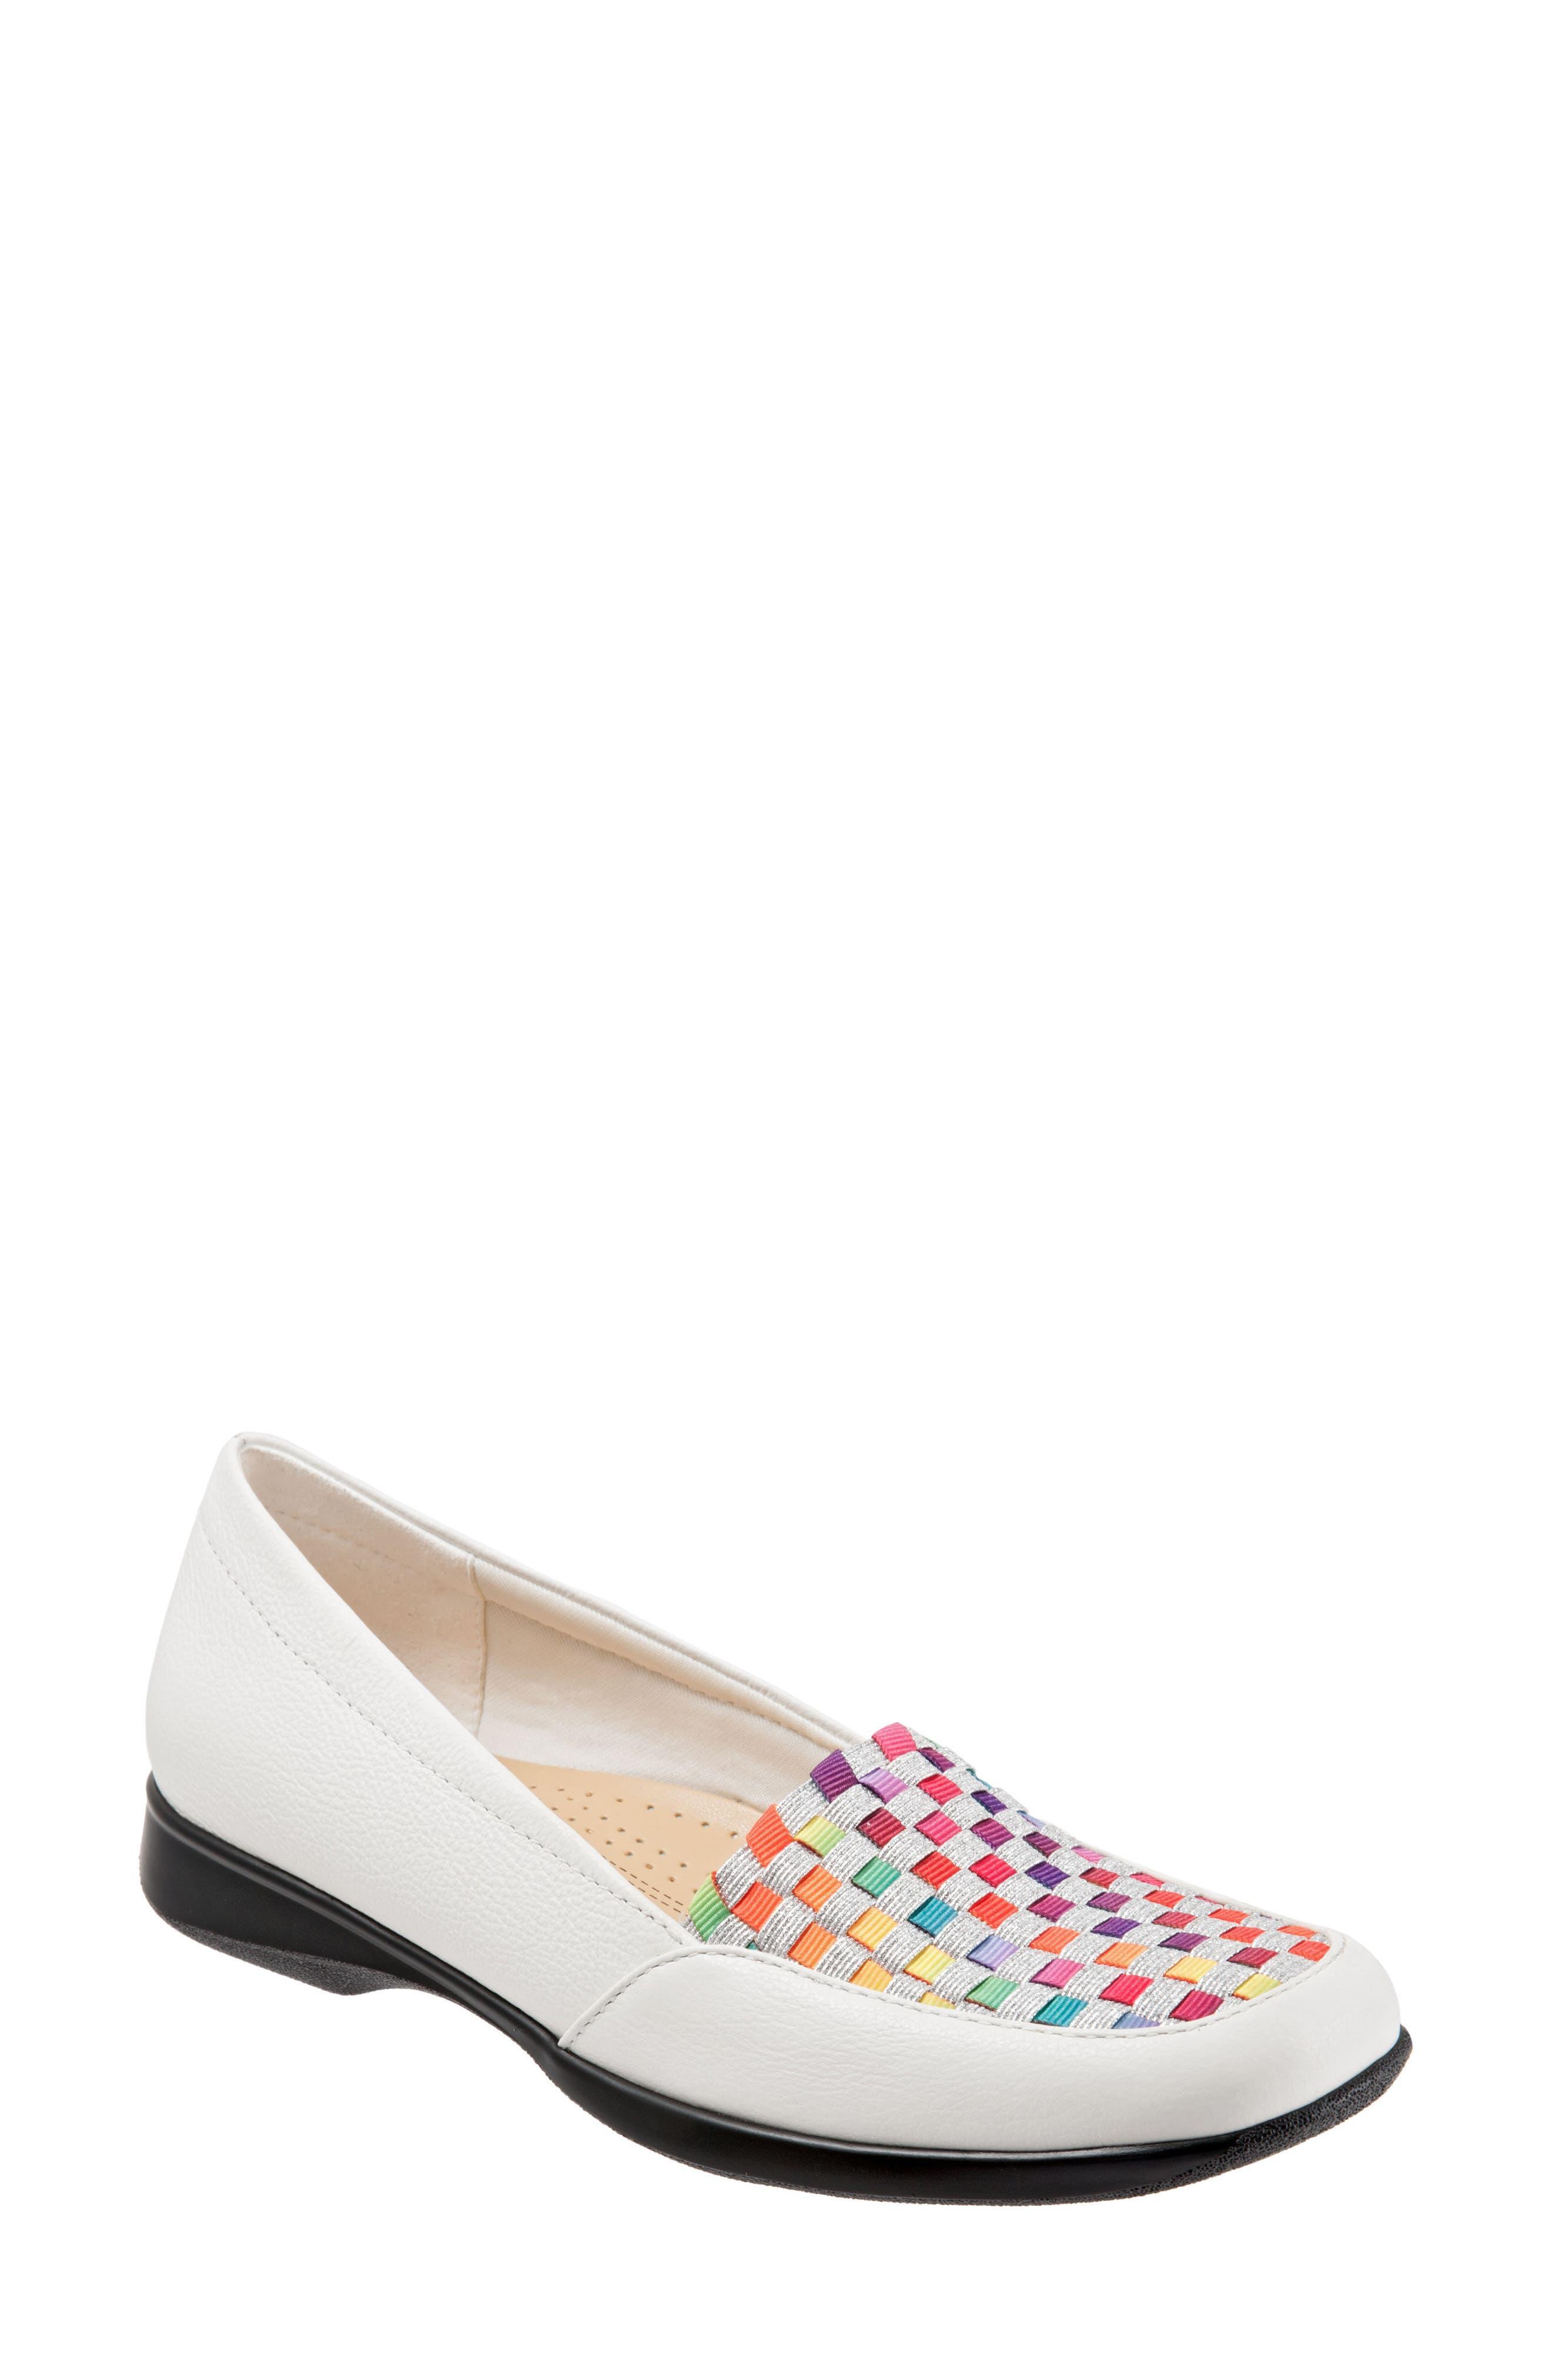 Alternate Image 1 Selected - Trotters Jenkins Loafer Flat (Women)